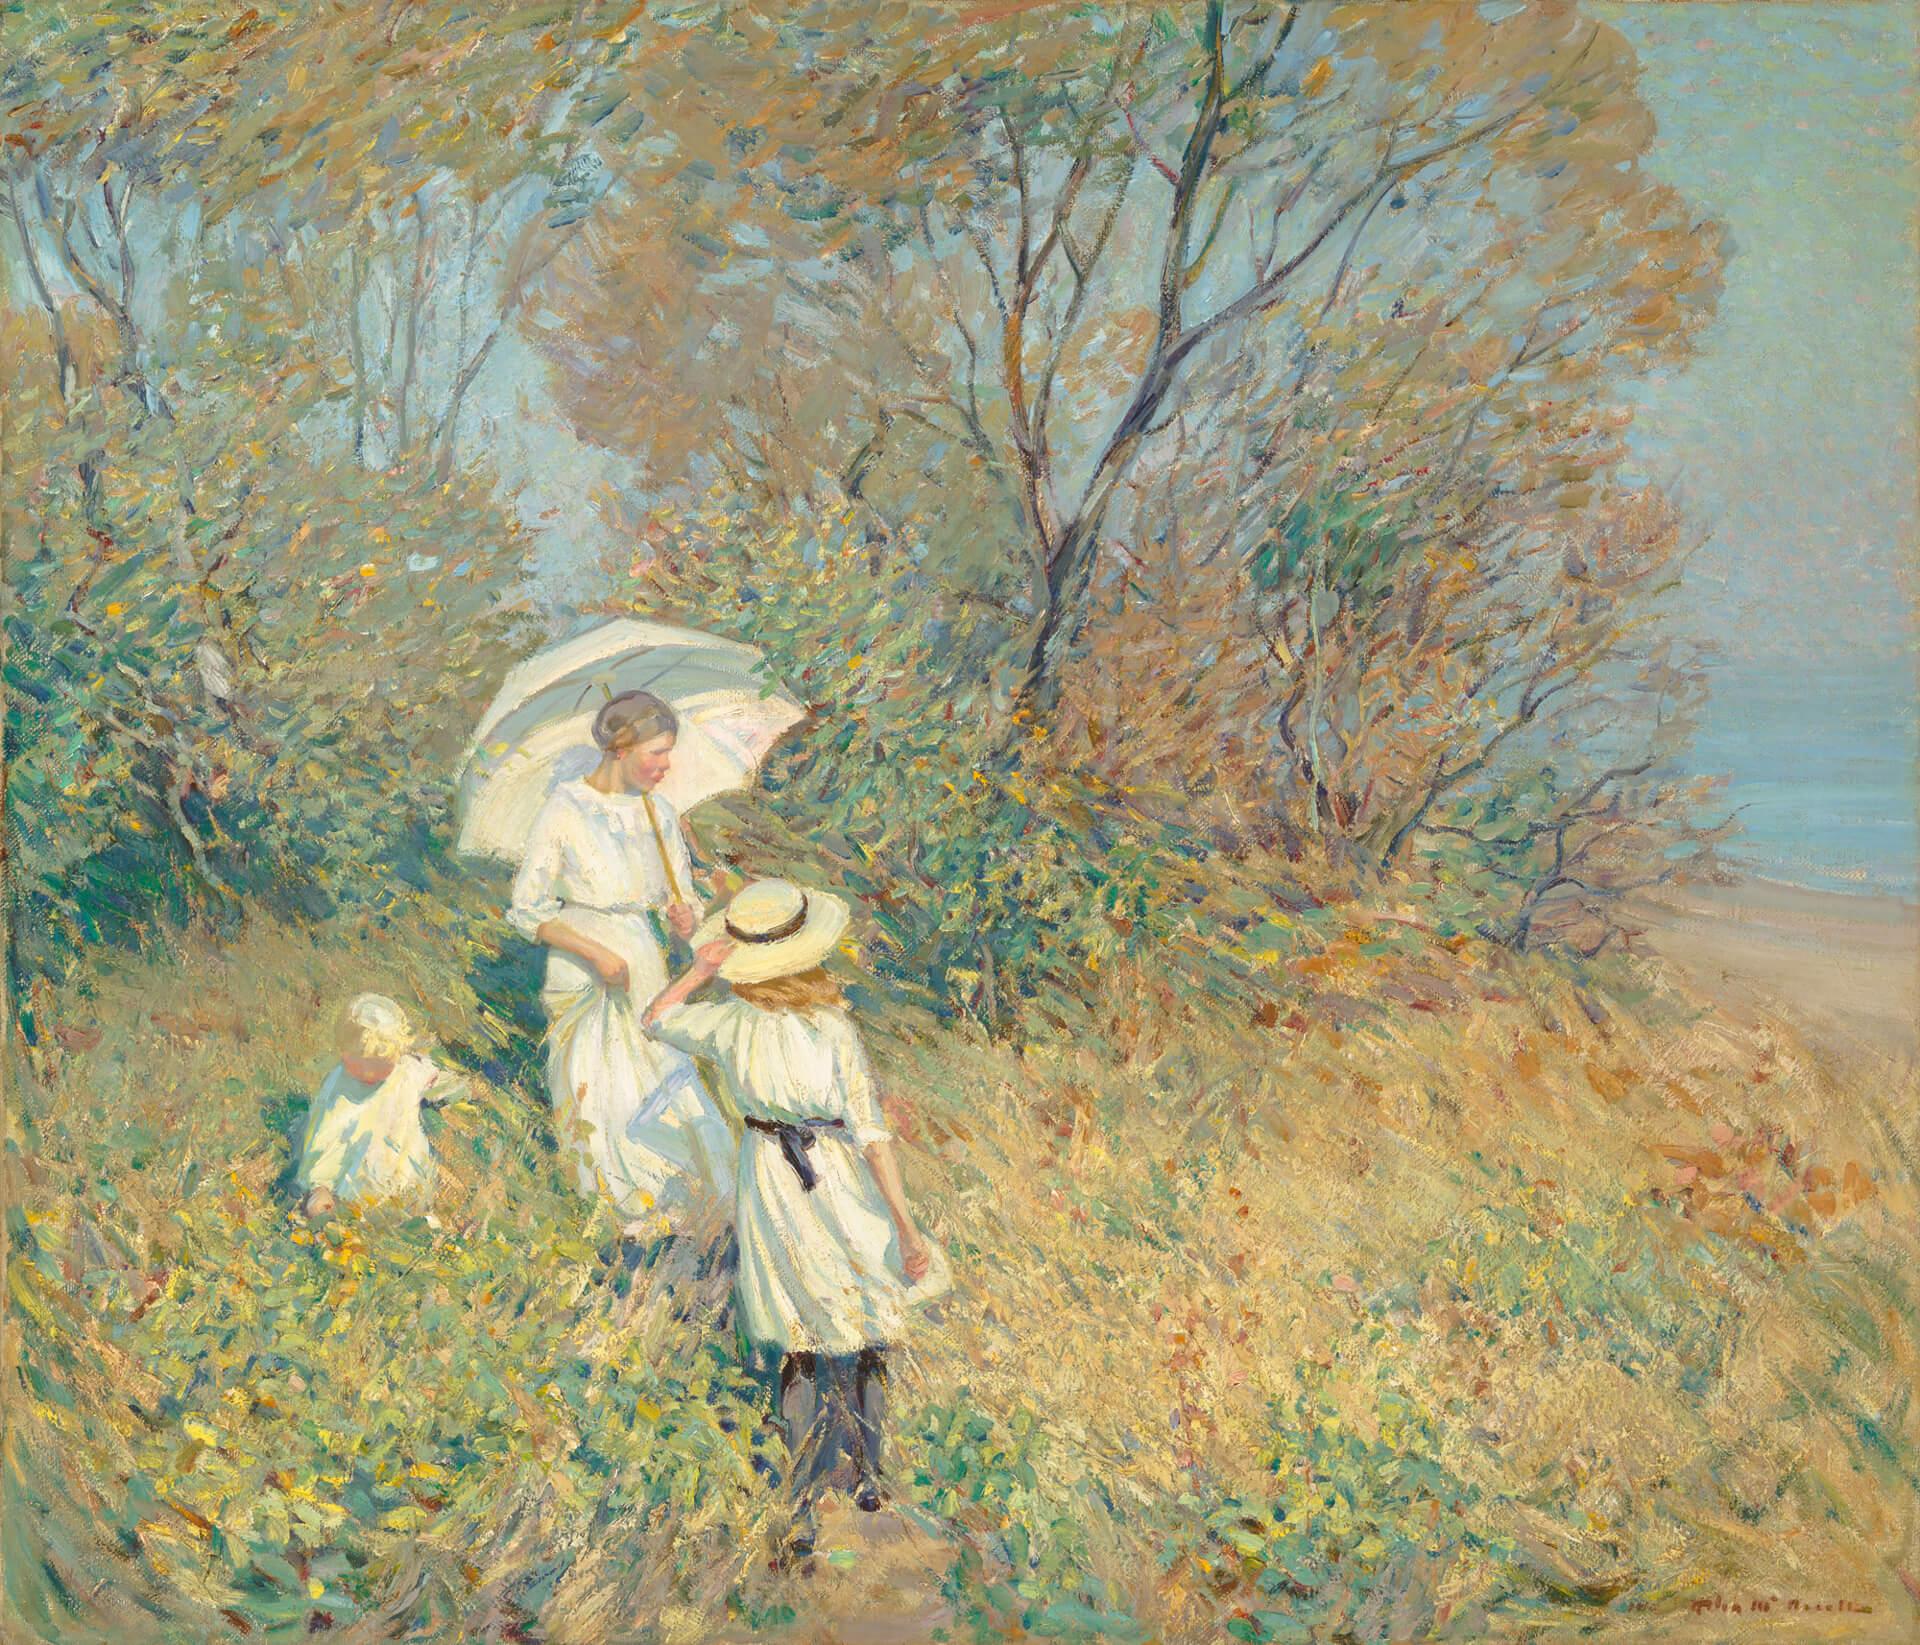 Helen McNicoll, Septembre ensoleillé, 1913